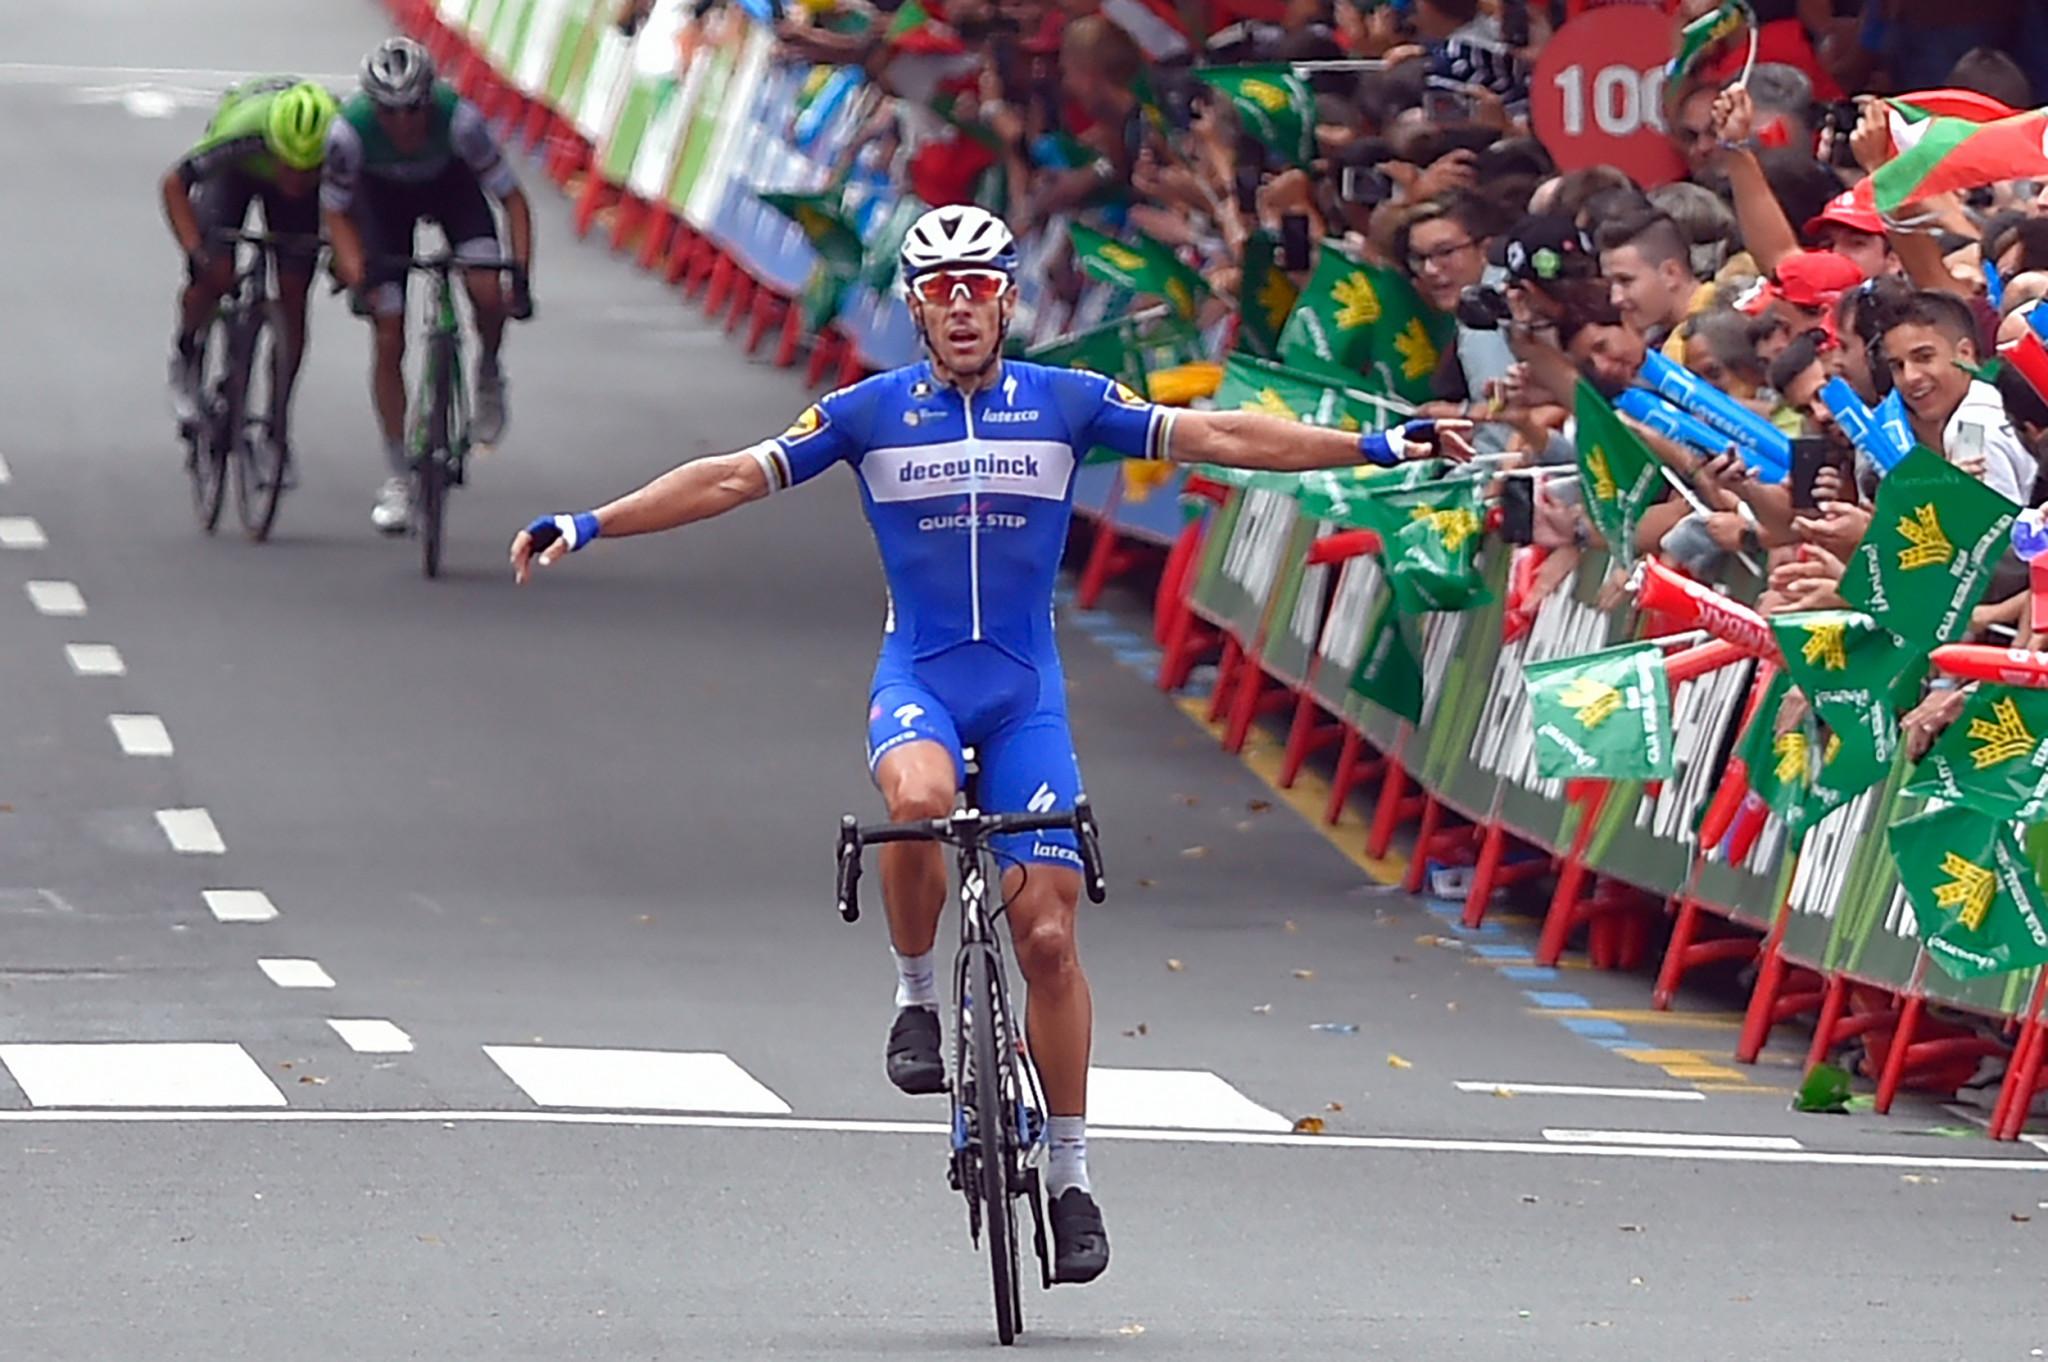 Gilbert wins stage 12 as Roglič retains red jersey at Vuelta a España